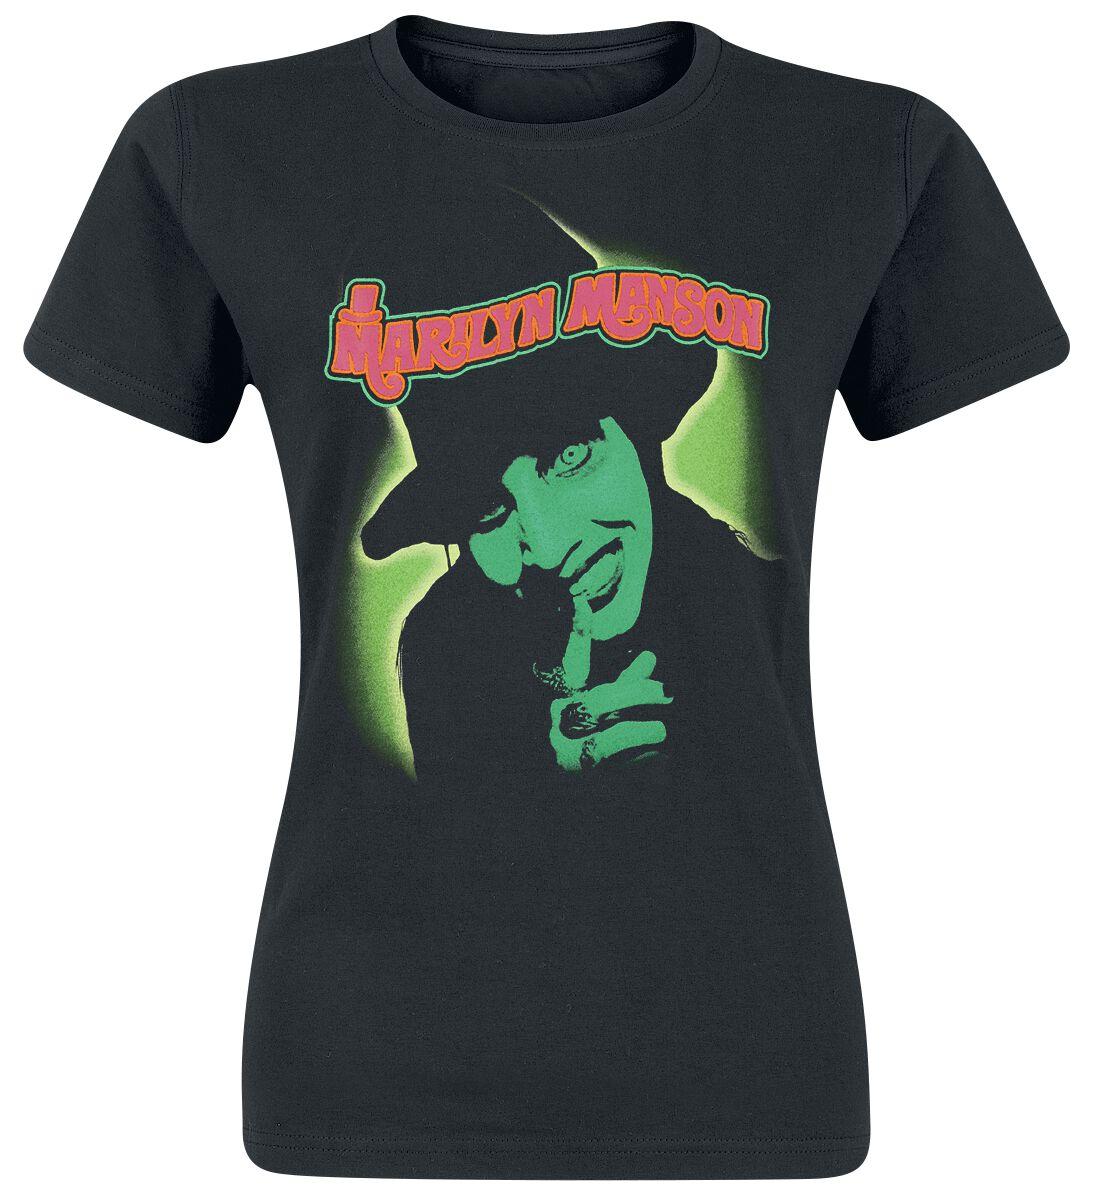 Zespoły - Koszulki - Koszulka damska Marilyn Manson Smells Like Children Koszulka damska czarny - 368103